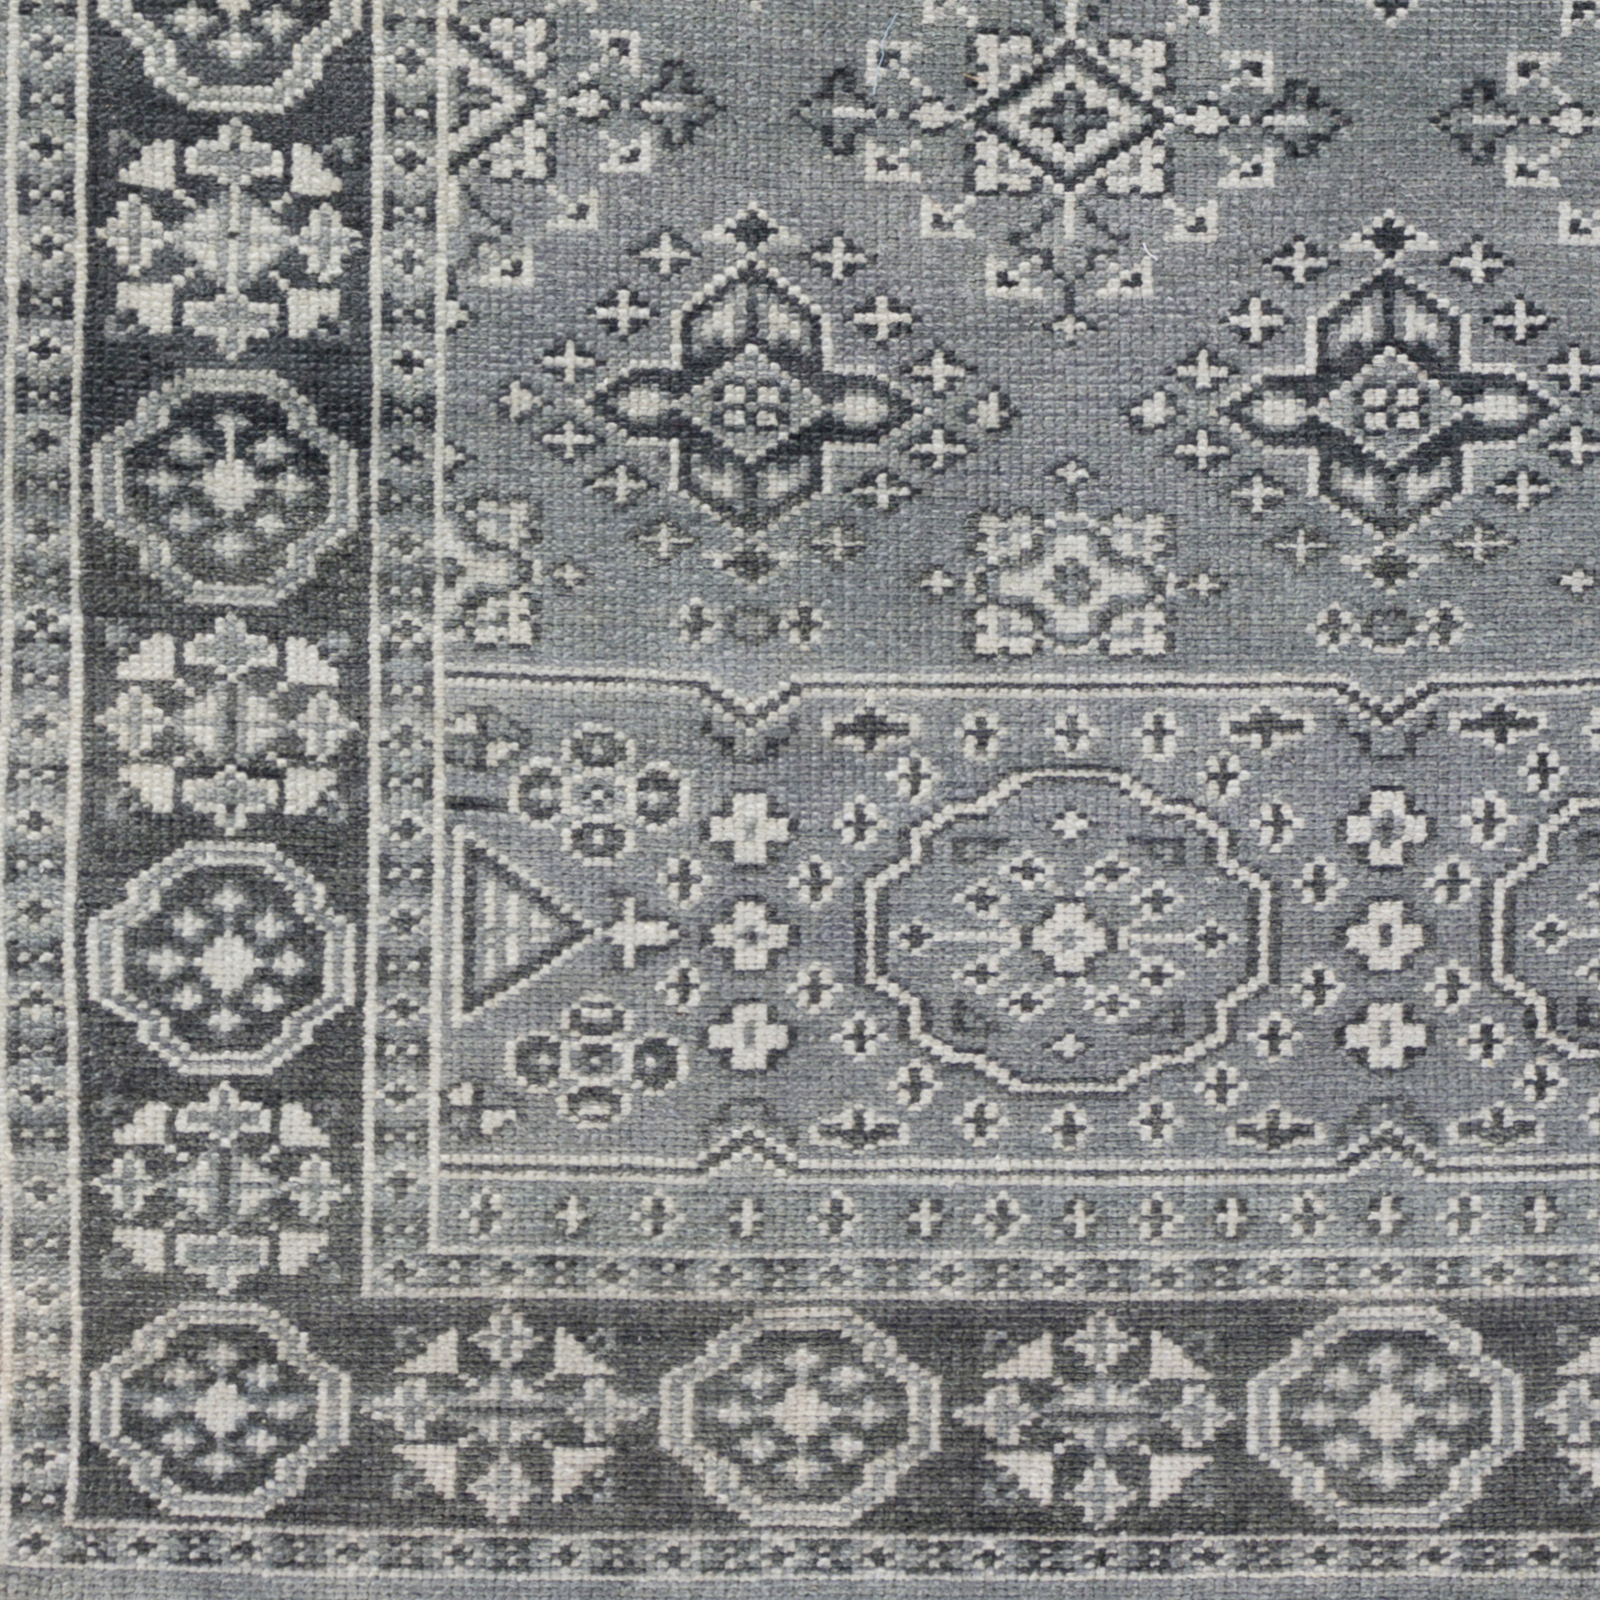 Cappadocia 2' x 3' Area Rug